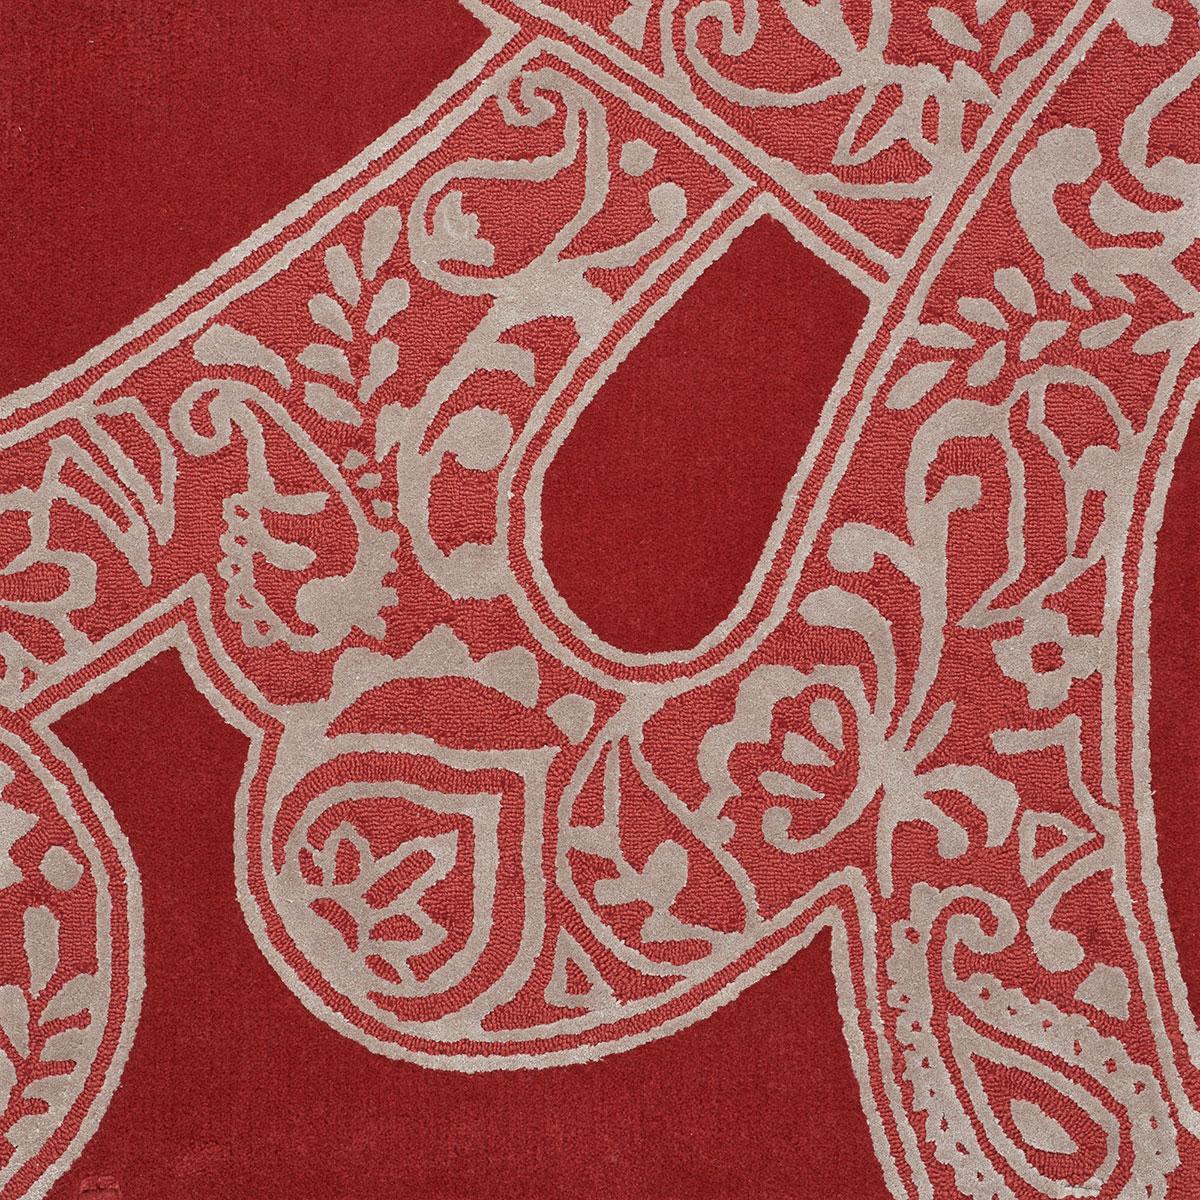 chantilly-lace_wool-silk_hand-tufted_patterson-flynn-martin_pfm